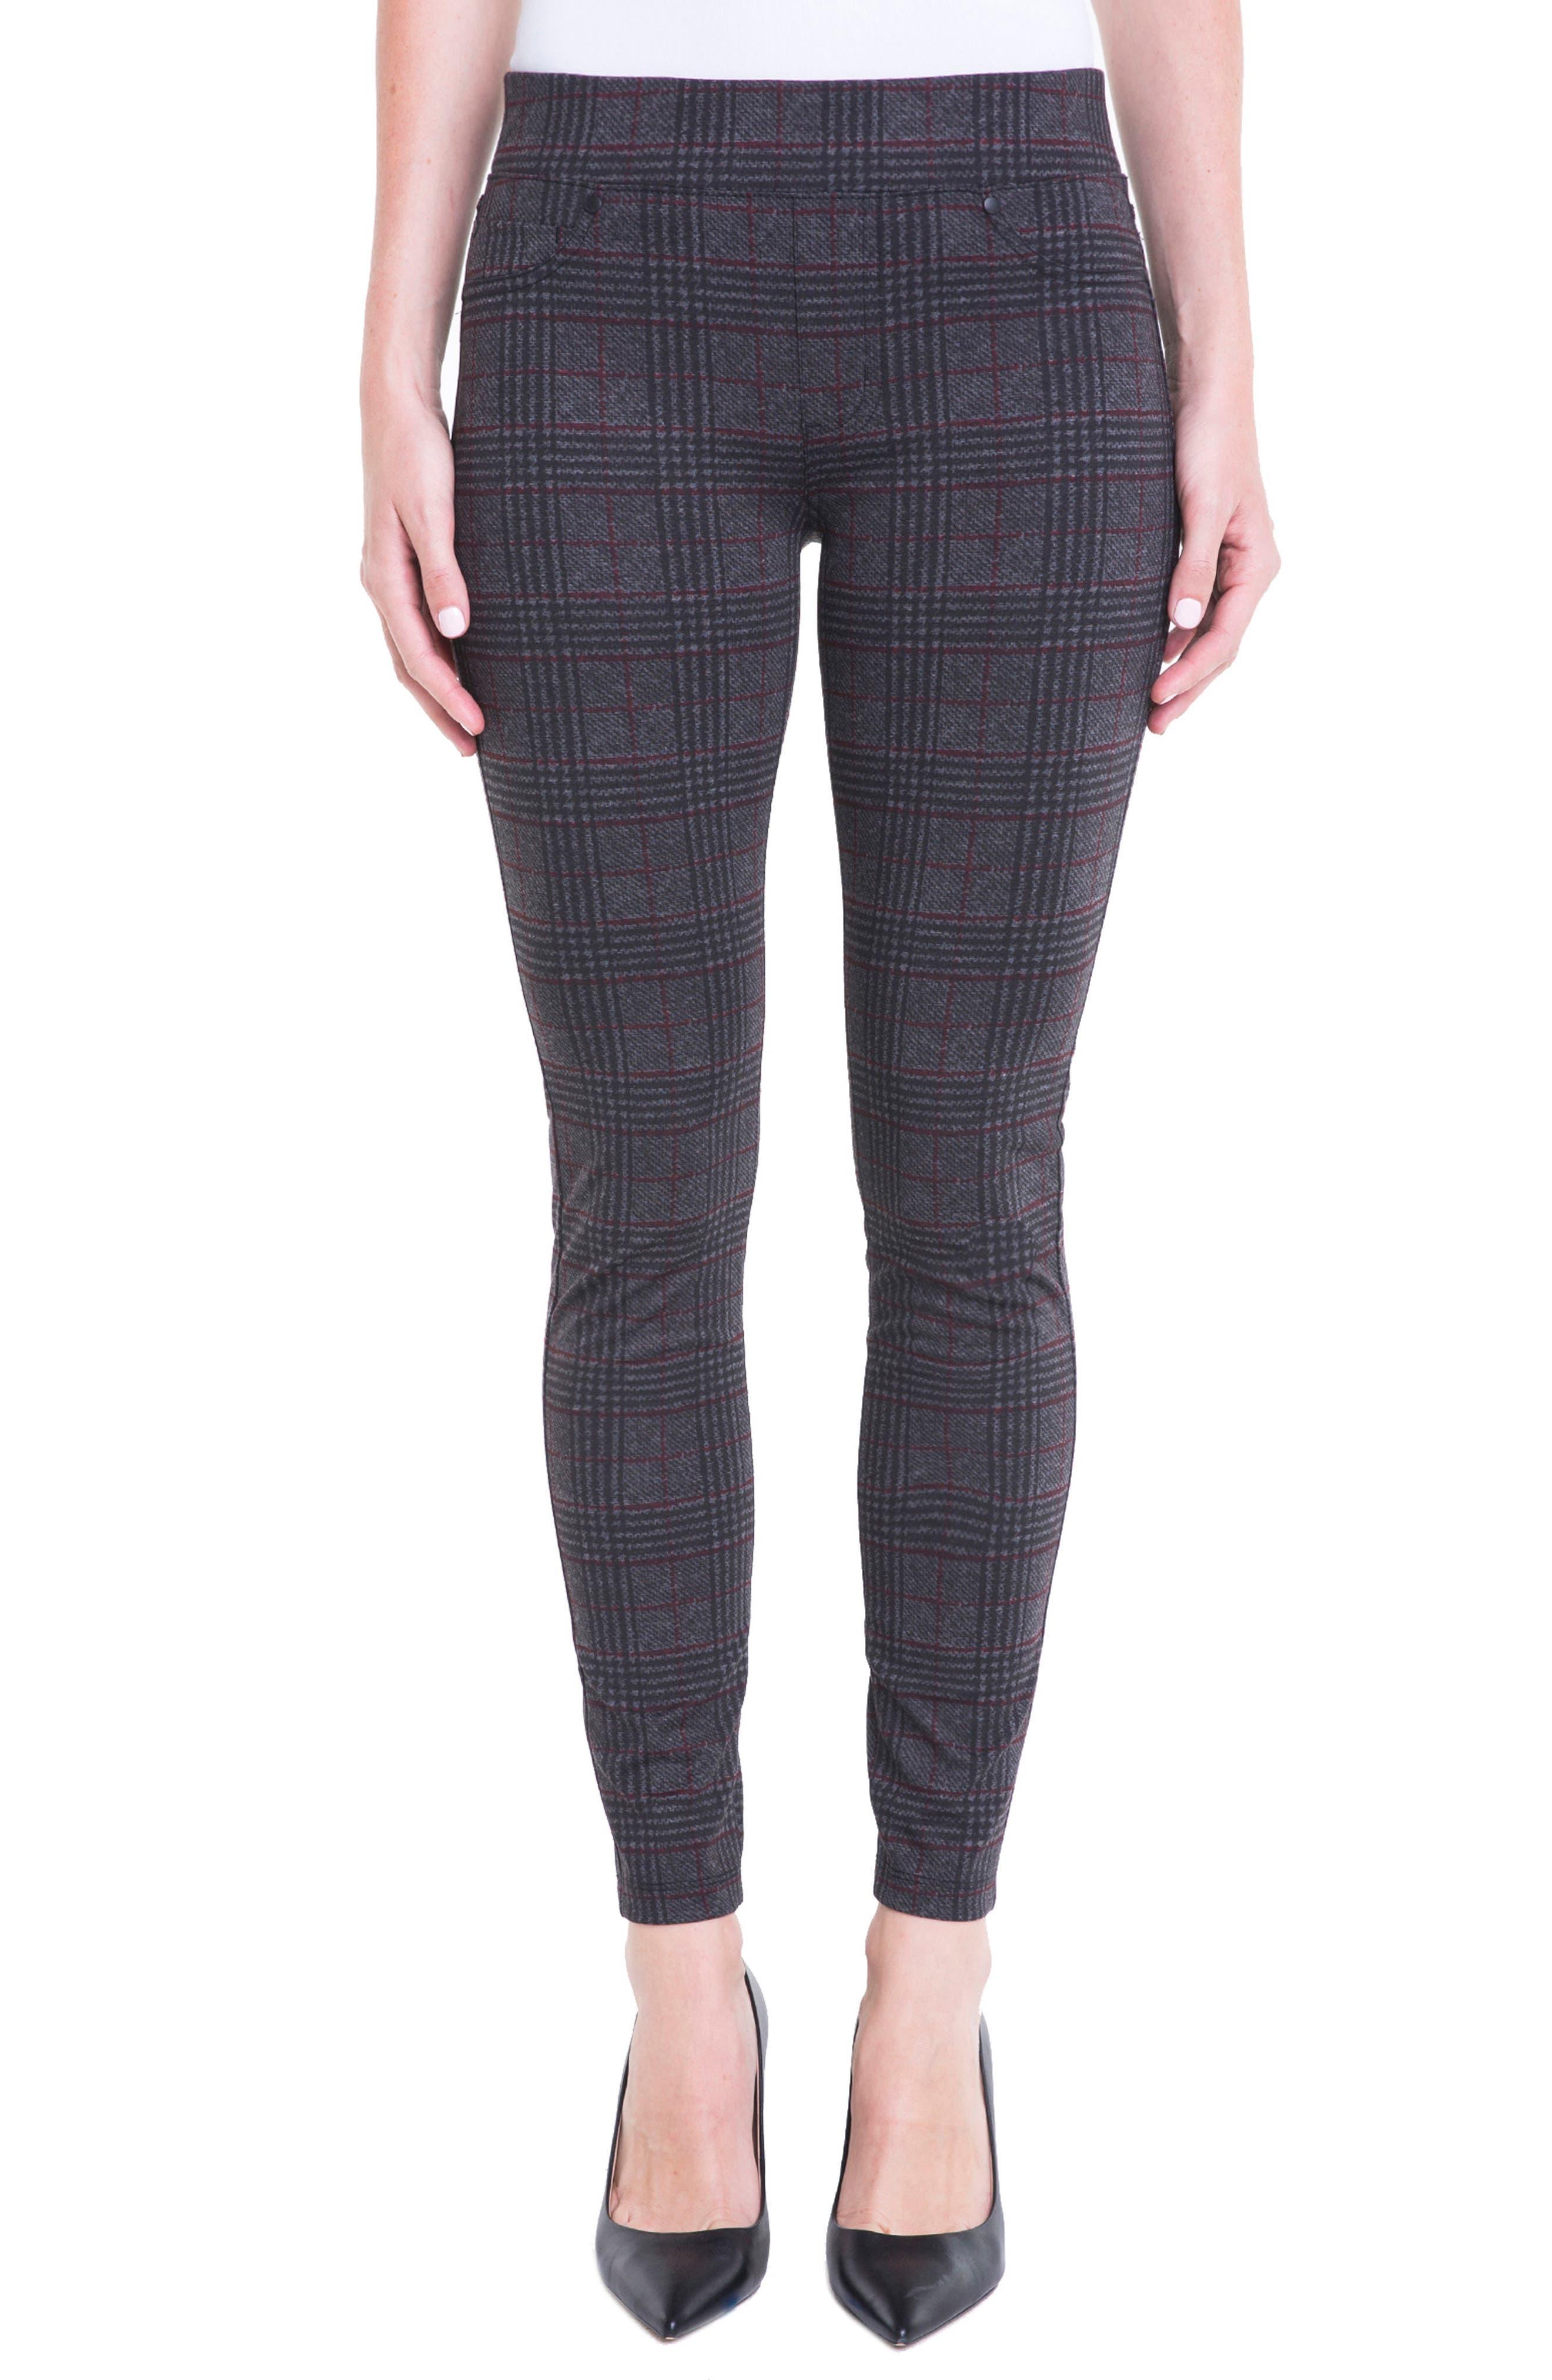 Liverpool Jeans Company Sienna Glen Plaid Leggings